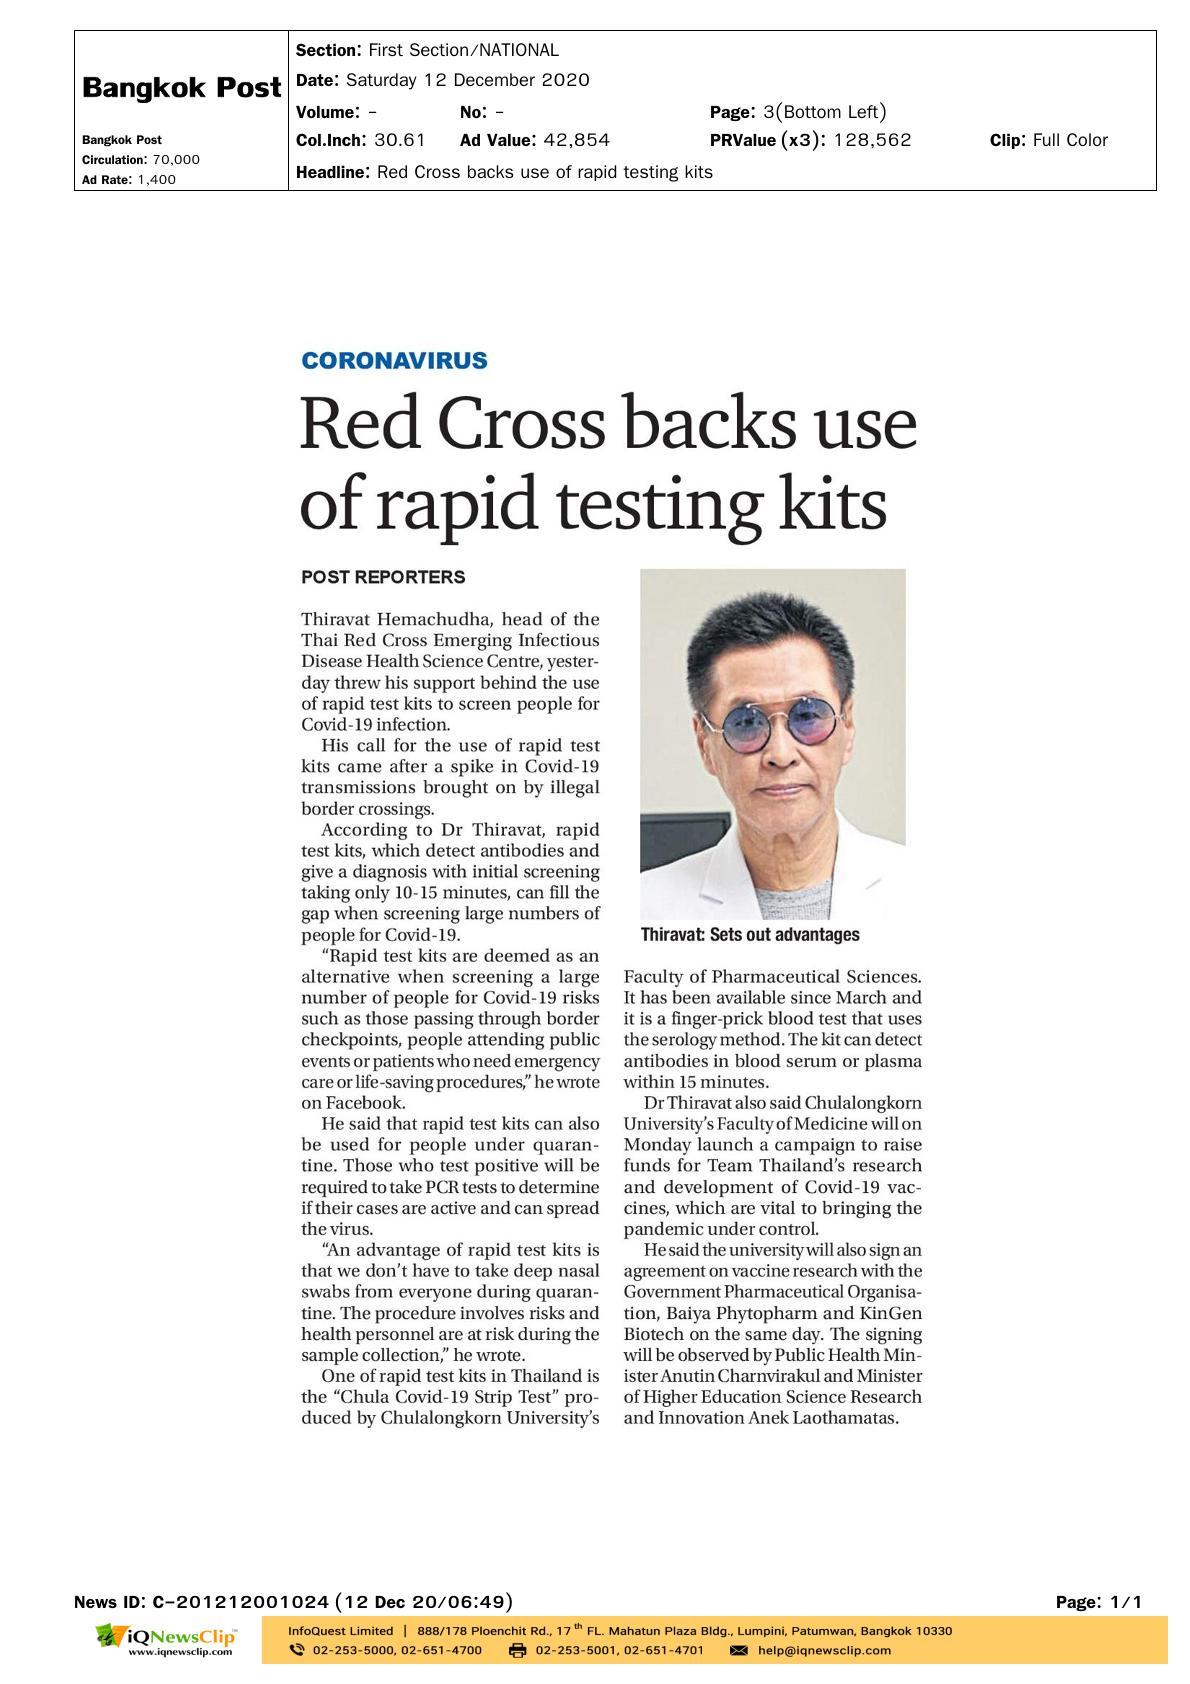 Red Cross backs use of rapid testing kits